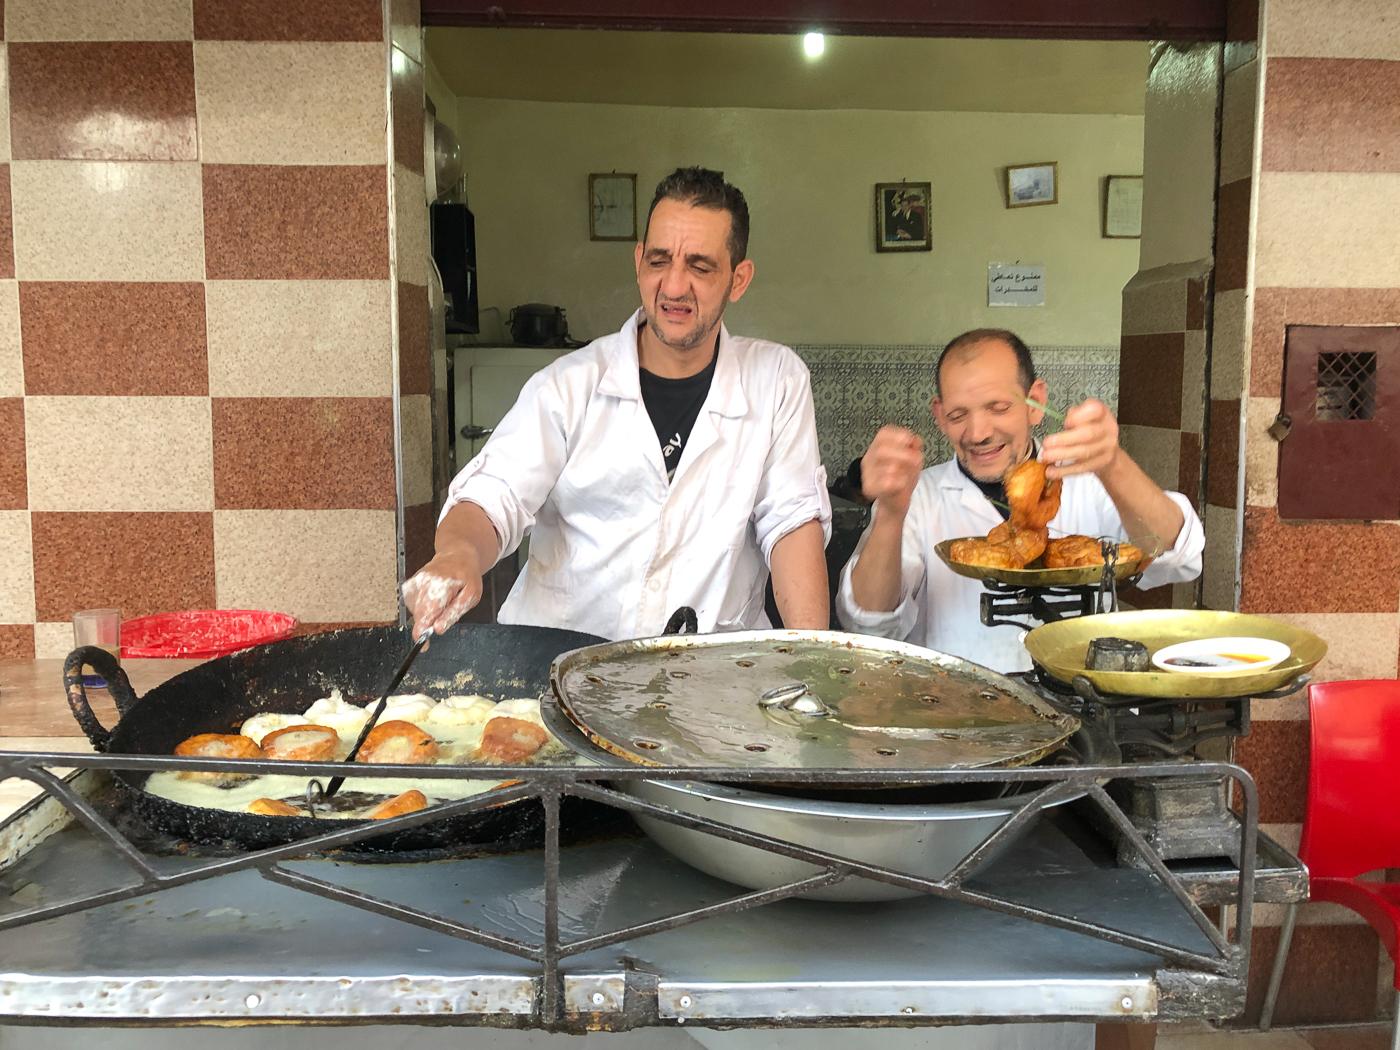 Restaurant de street food à Marrakech - Sfenj/Beignes